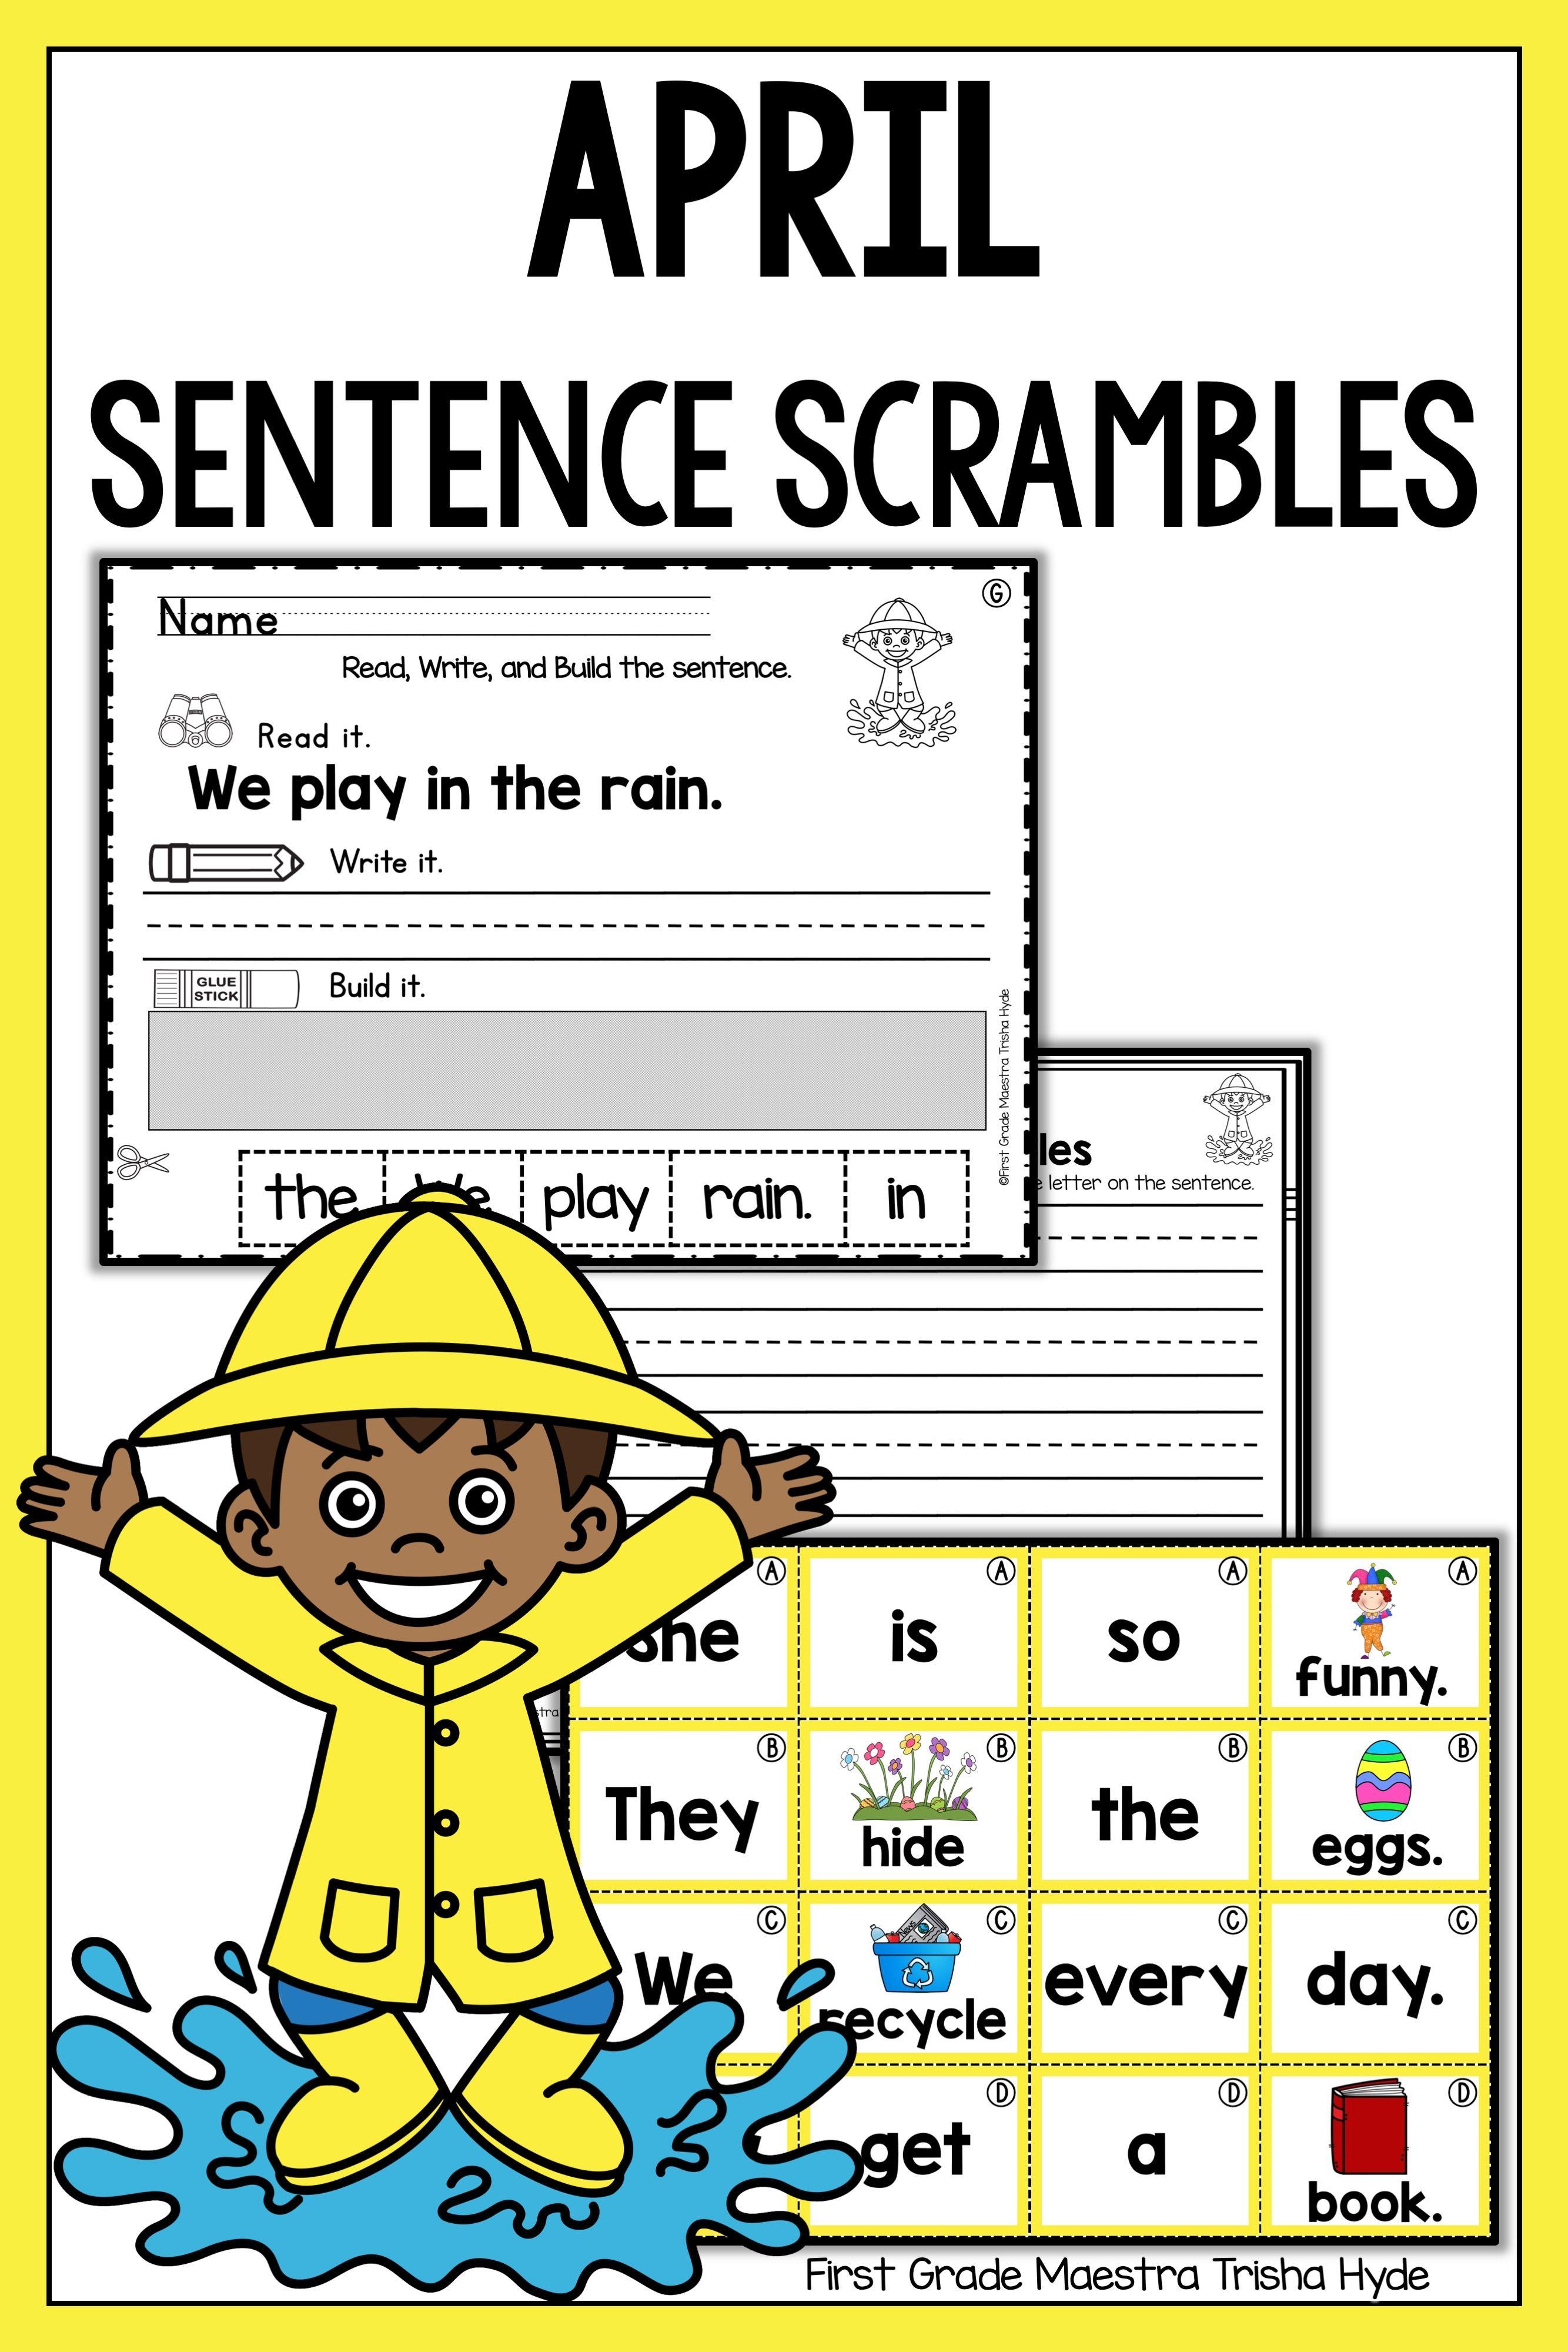 April Sentence Scrambles